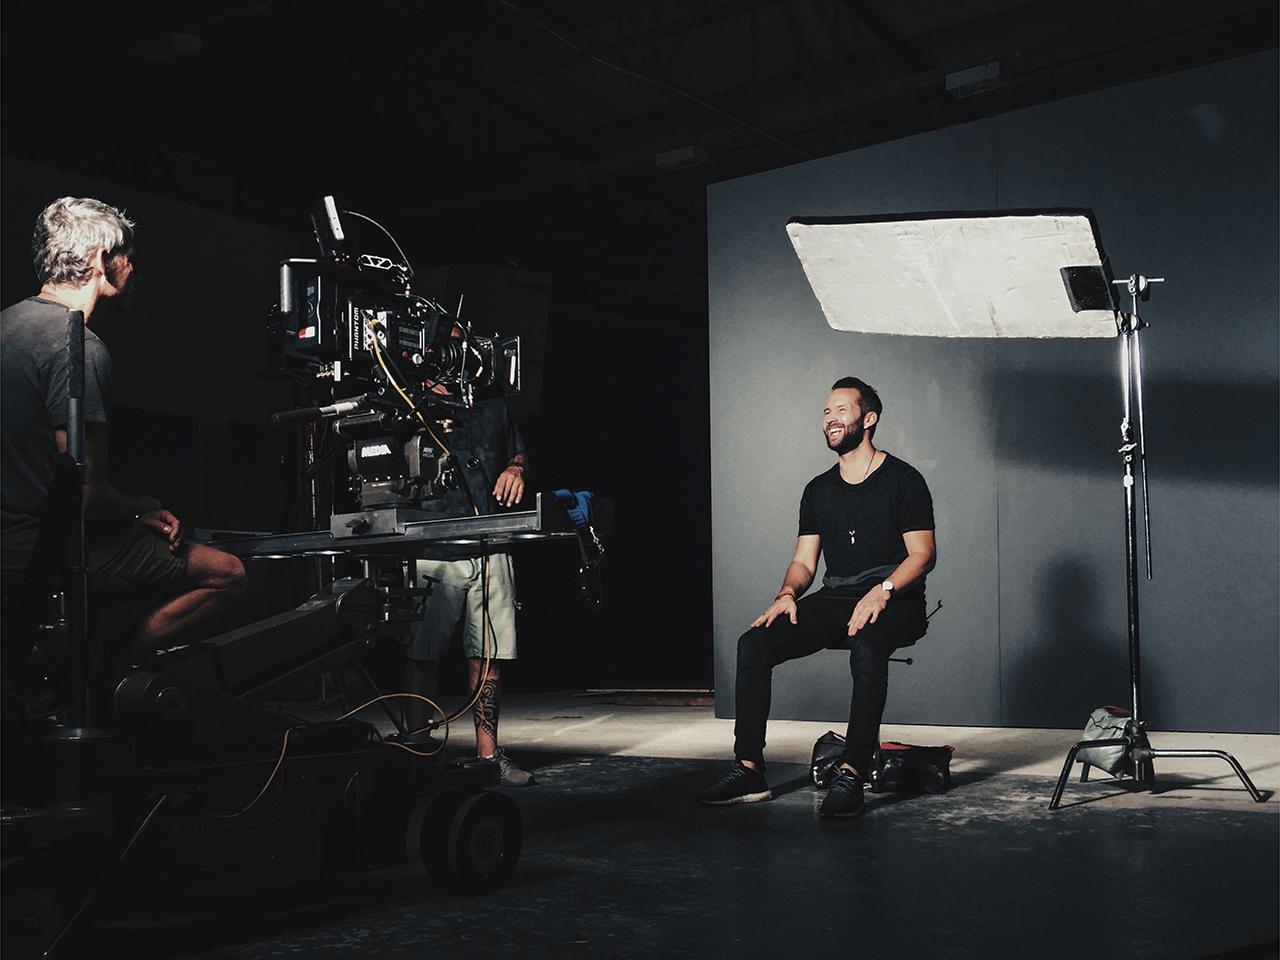 filmset-behind-the-scenes-filmer